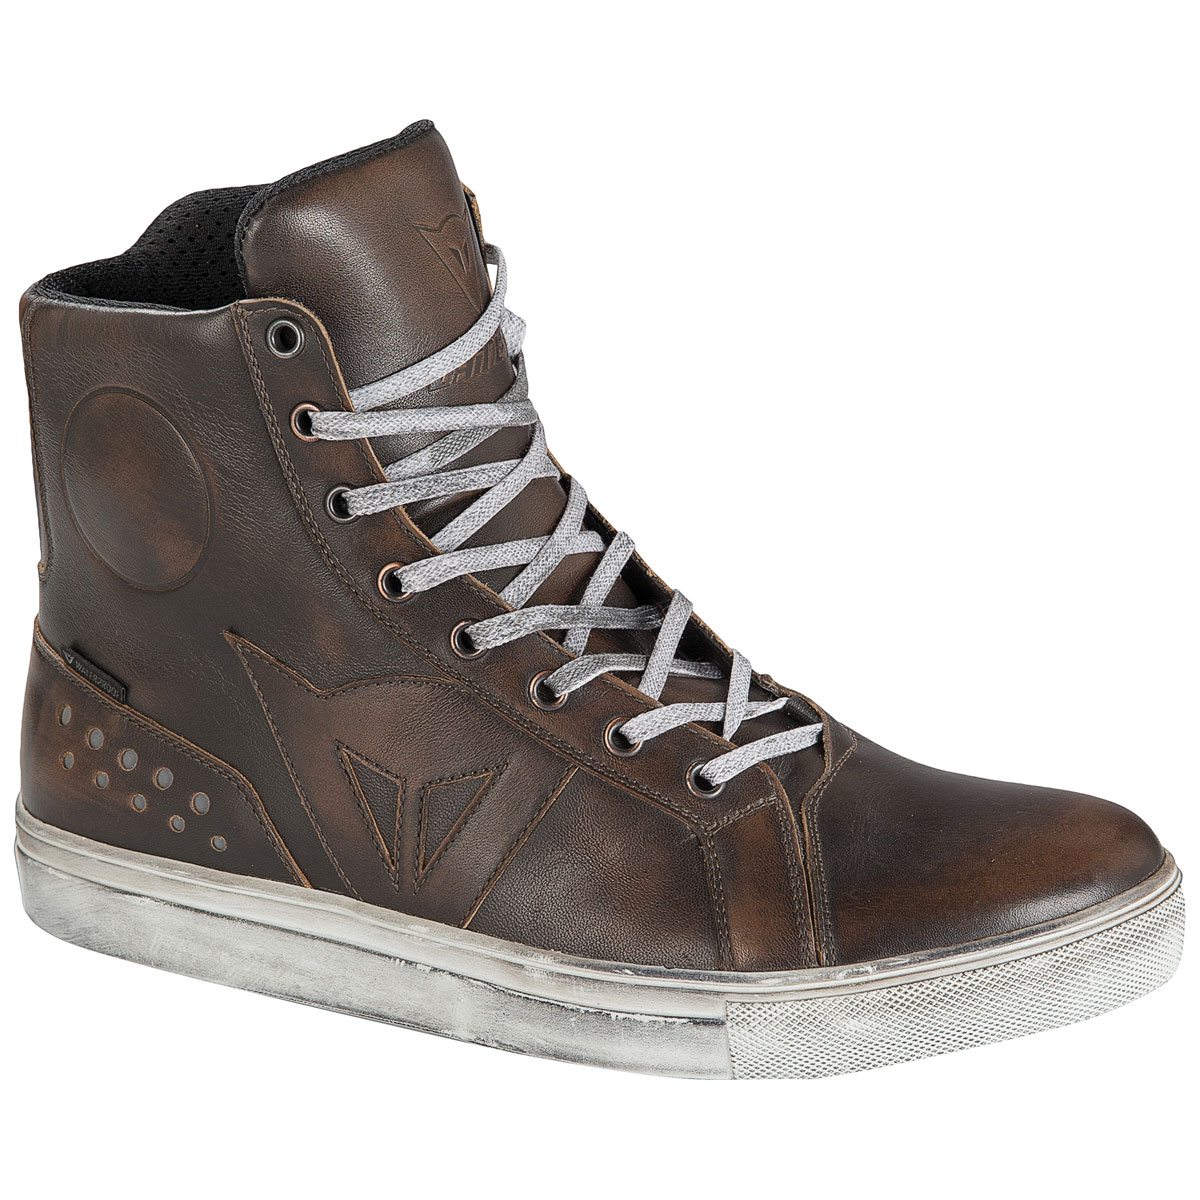 Dainese Men's Street Rocker D-WP Dark Brown Shoes